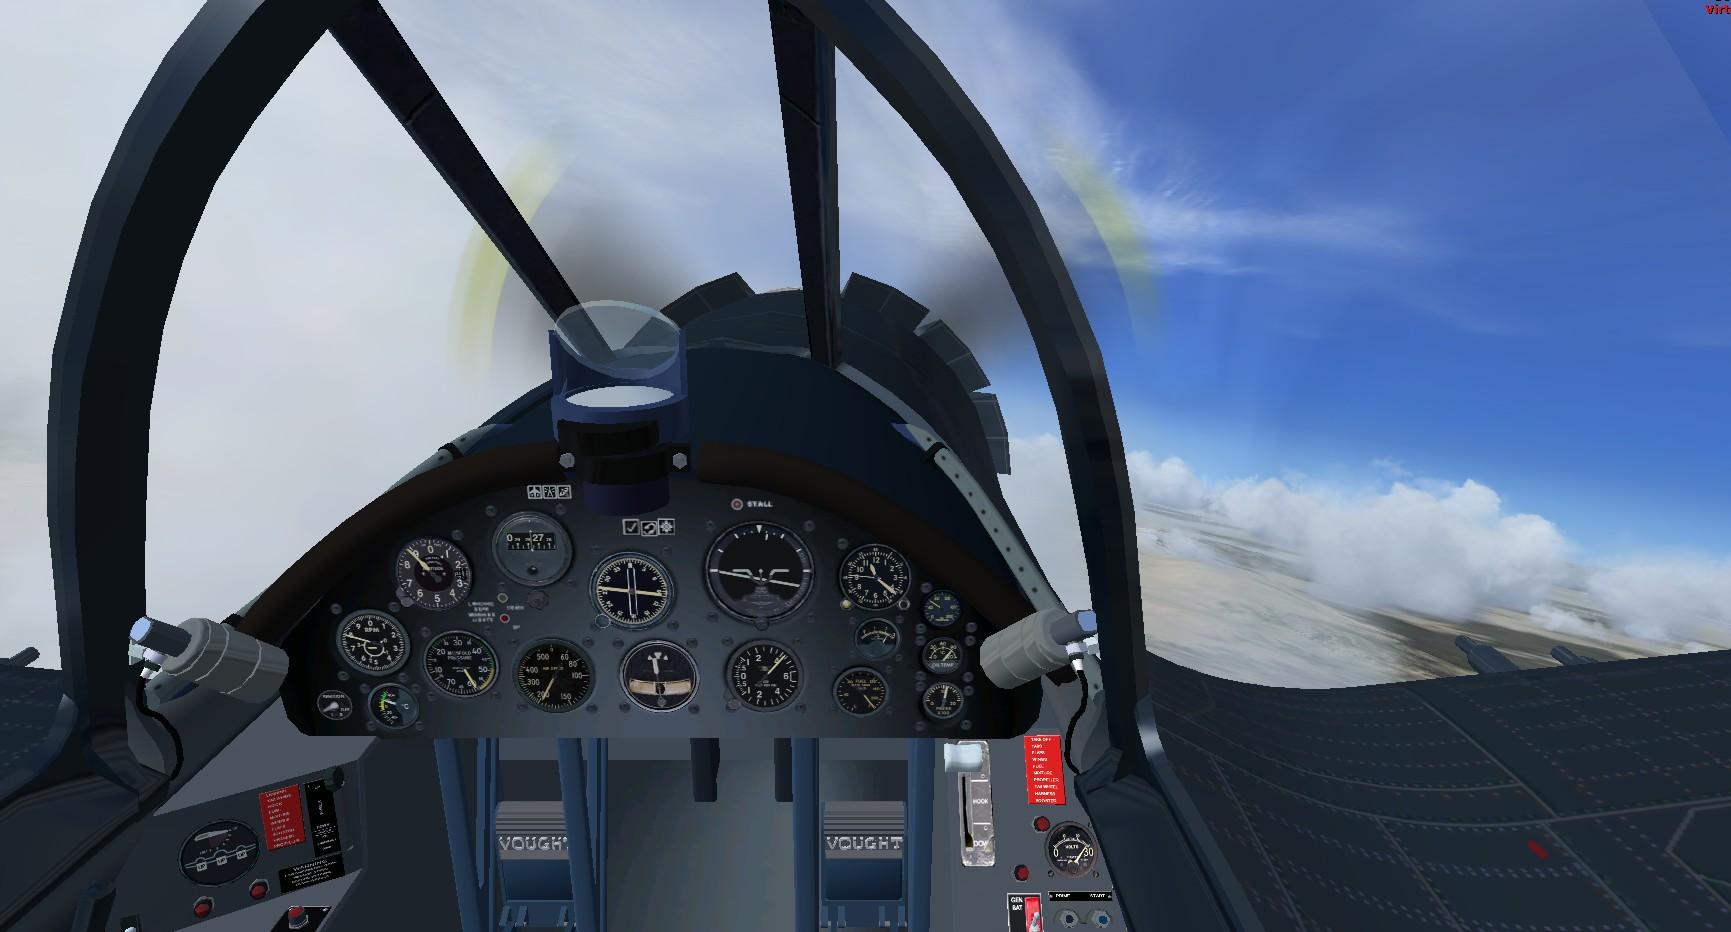 fs-freeware net - FSX Acceleration Chance Vought F4U-7 Corsair